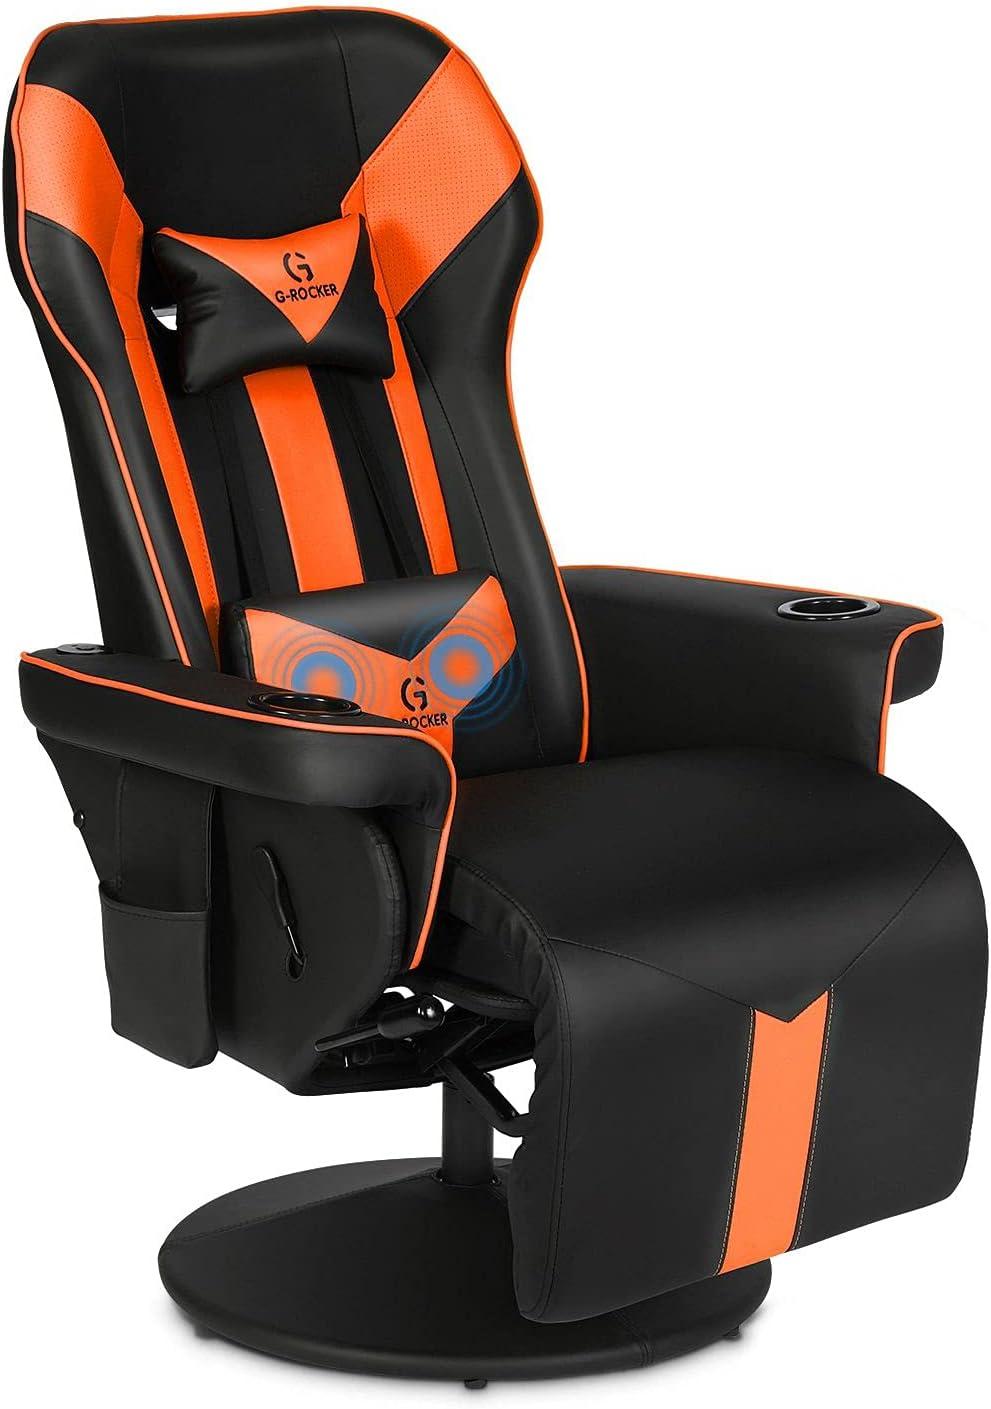 G-ROCKER King Throne Surprise price Video Gaming Ergonomic Chair Recliner High Same day shipping